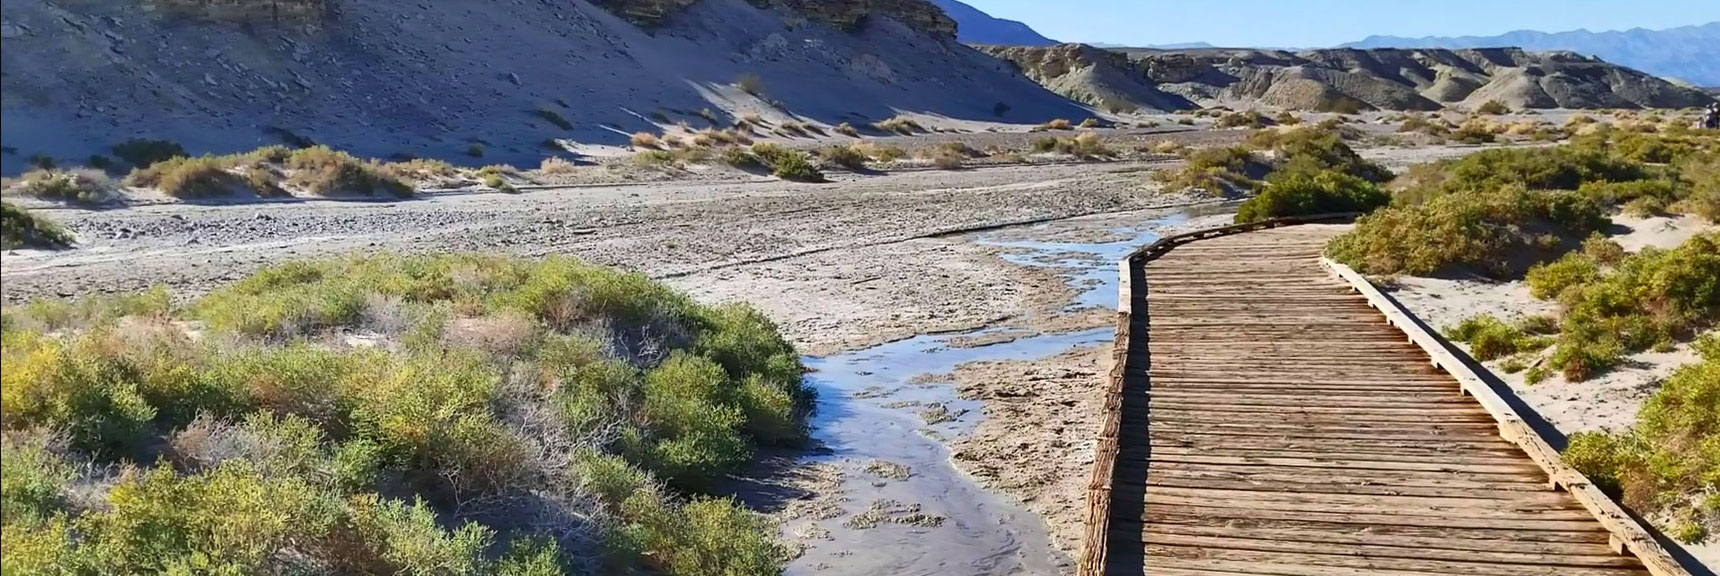 Death Valley National Park Salt Creek November 24th 2018